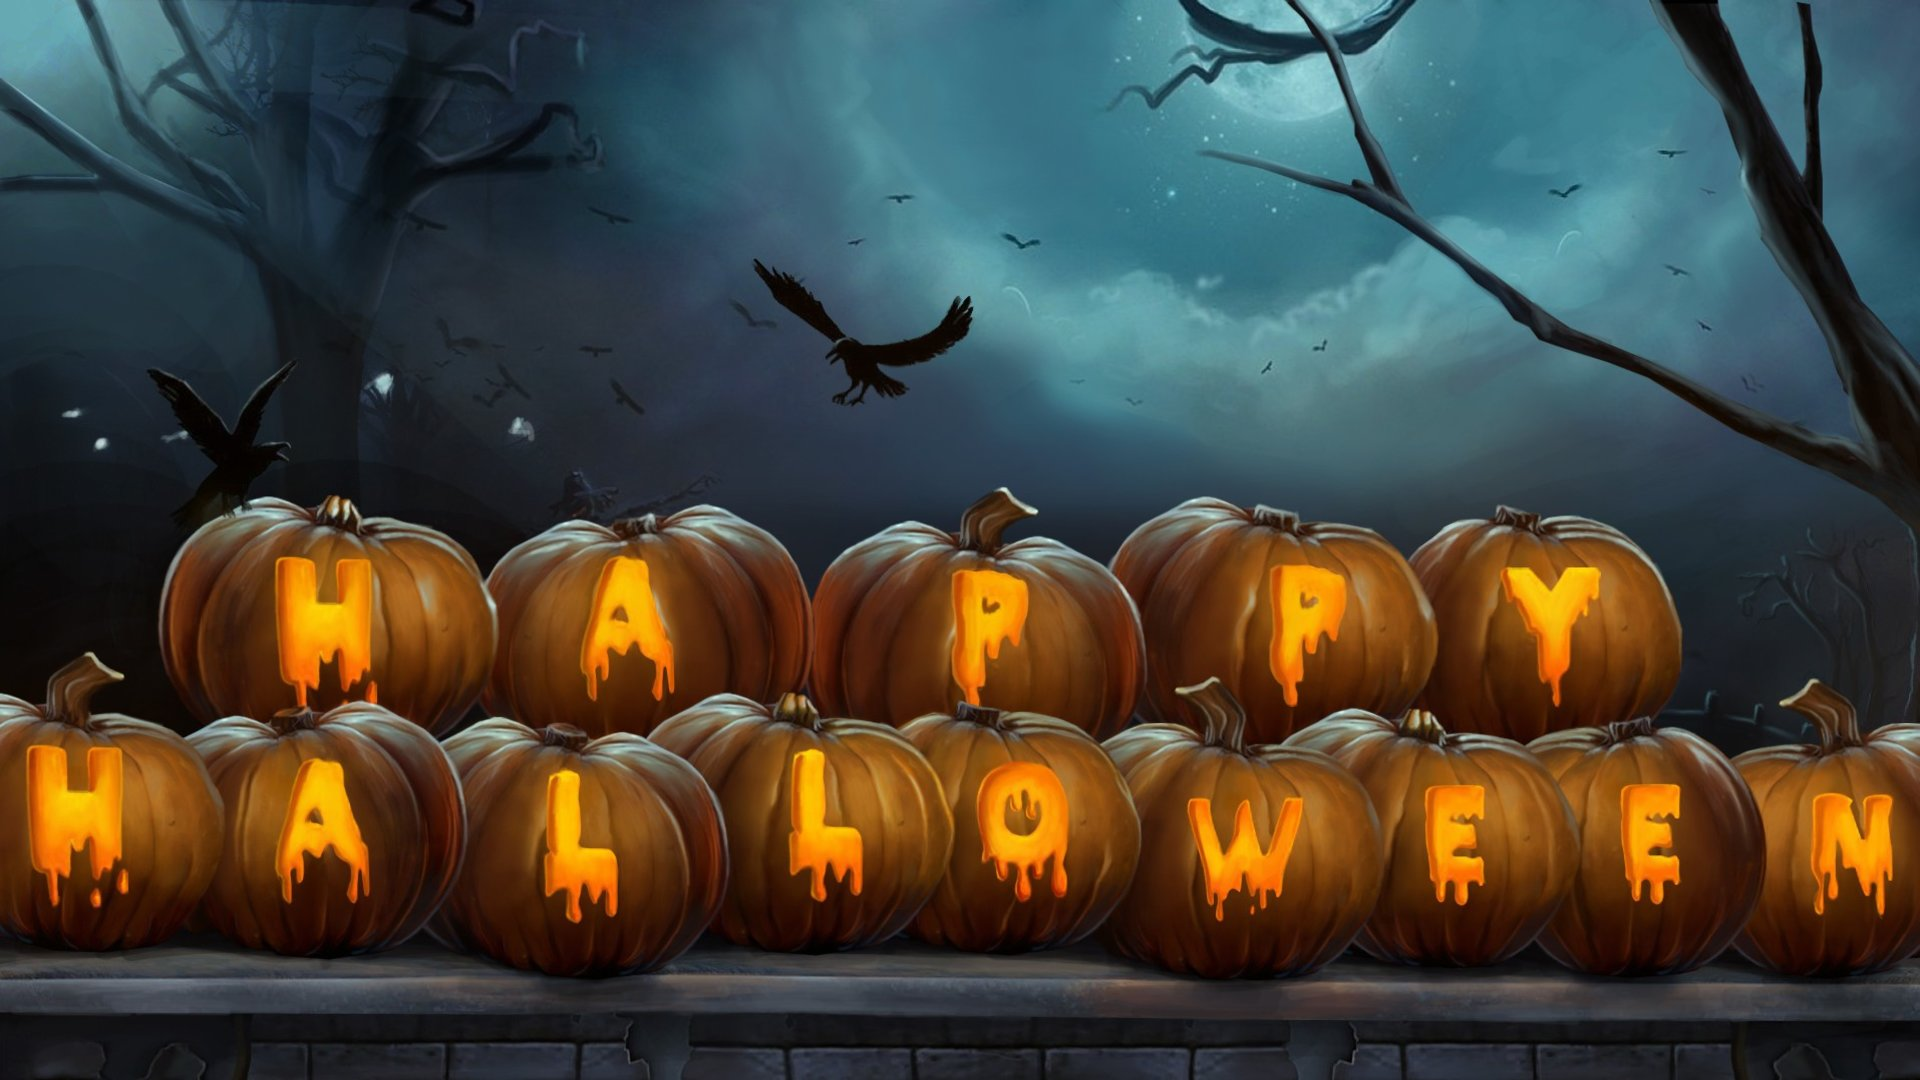 60] Beautiful Halloween Desktop Wallpaper on WallpaperSafari 1920x1080